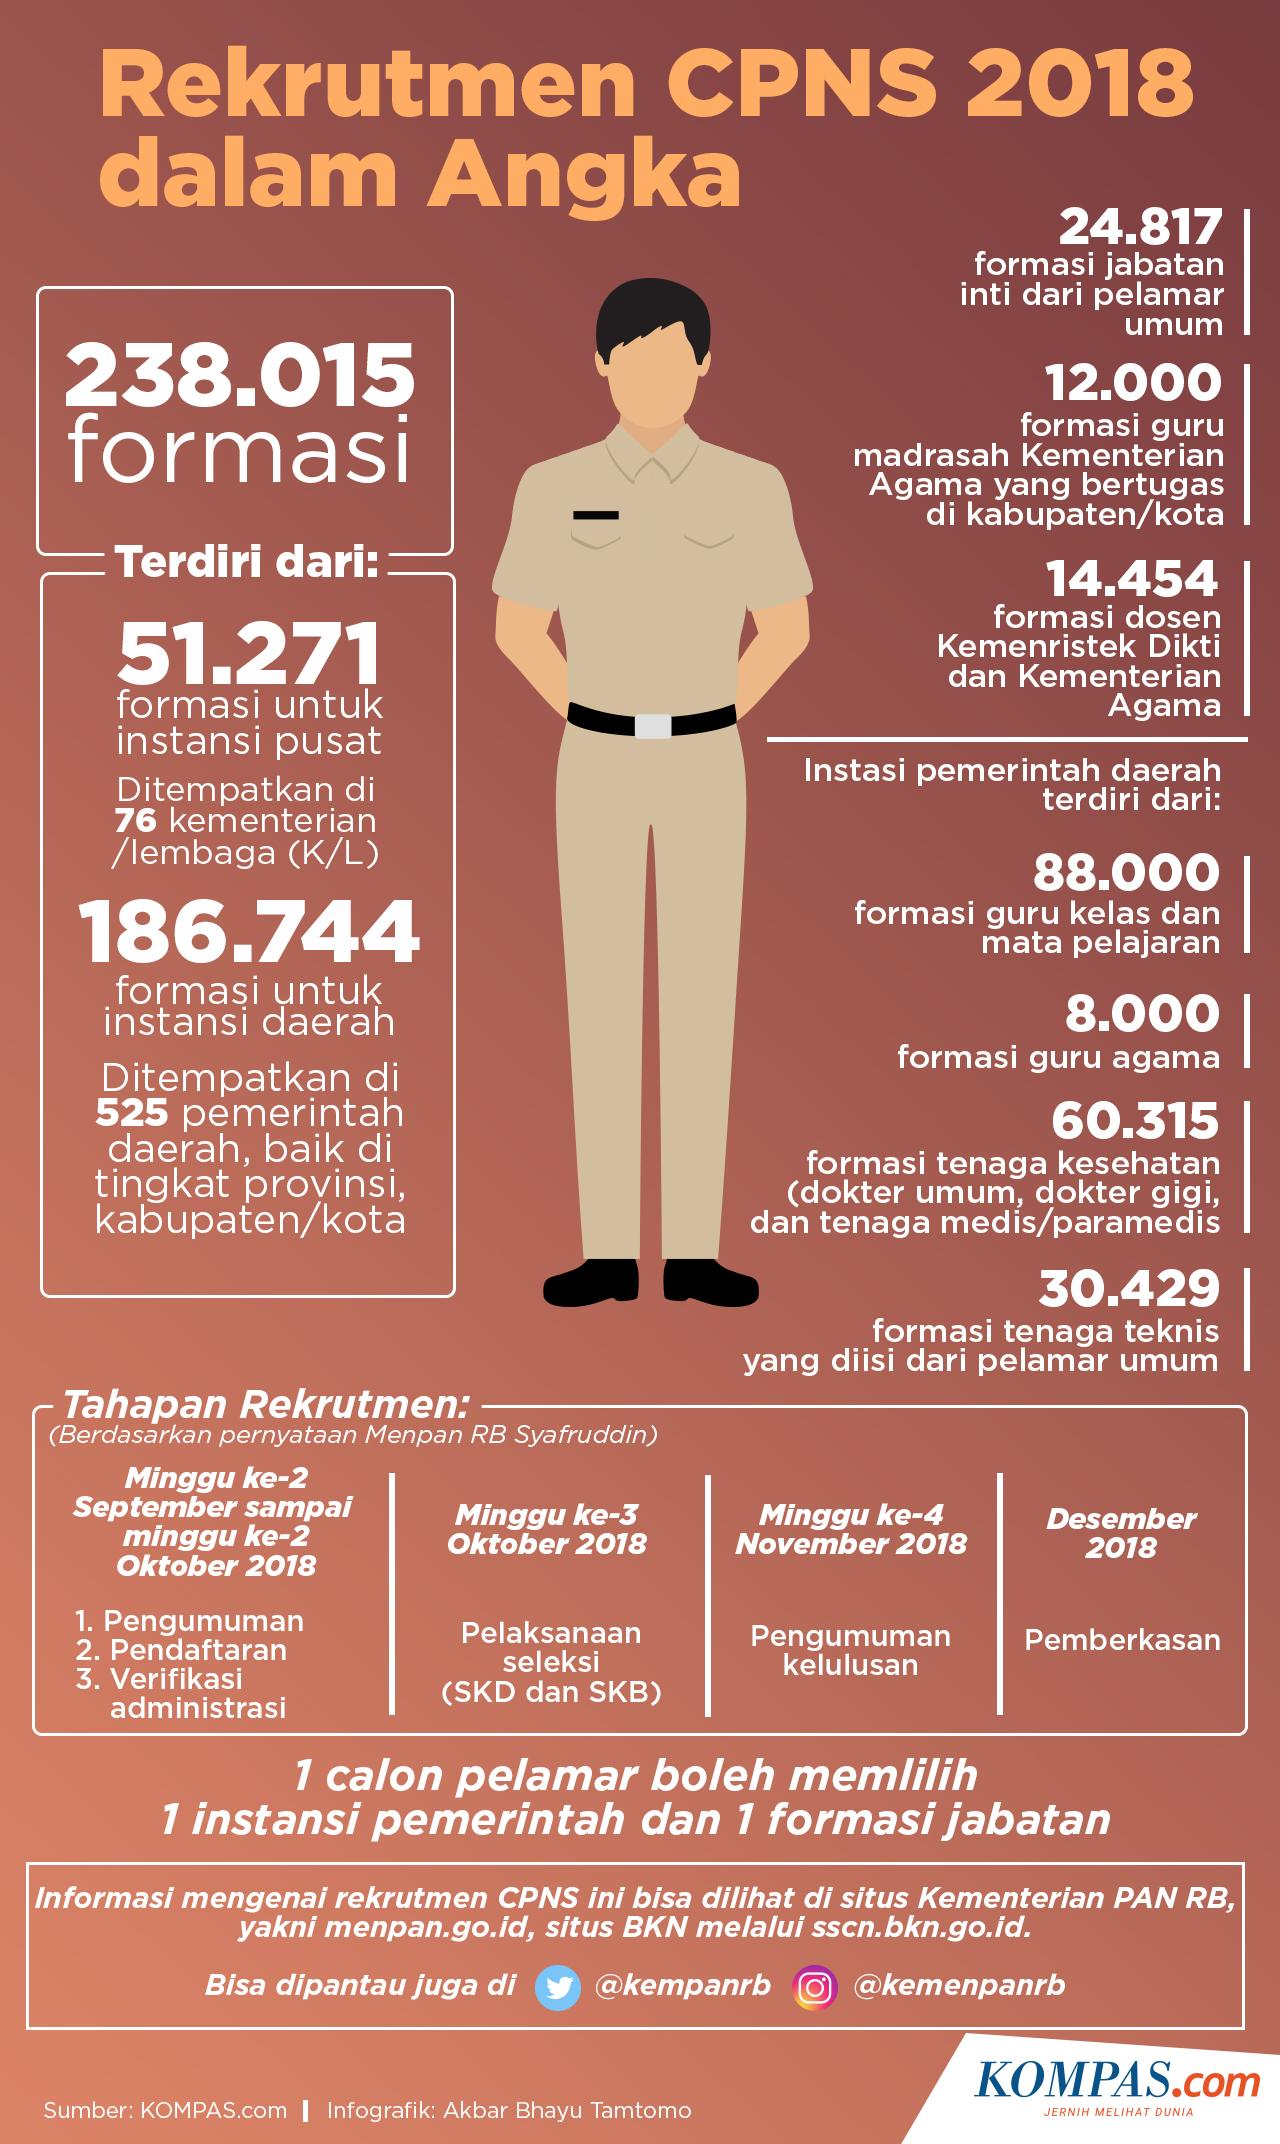 Infografik: Rekrutmen CPNS 2018 Dalam Angka